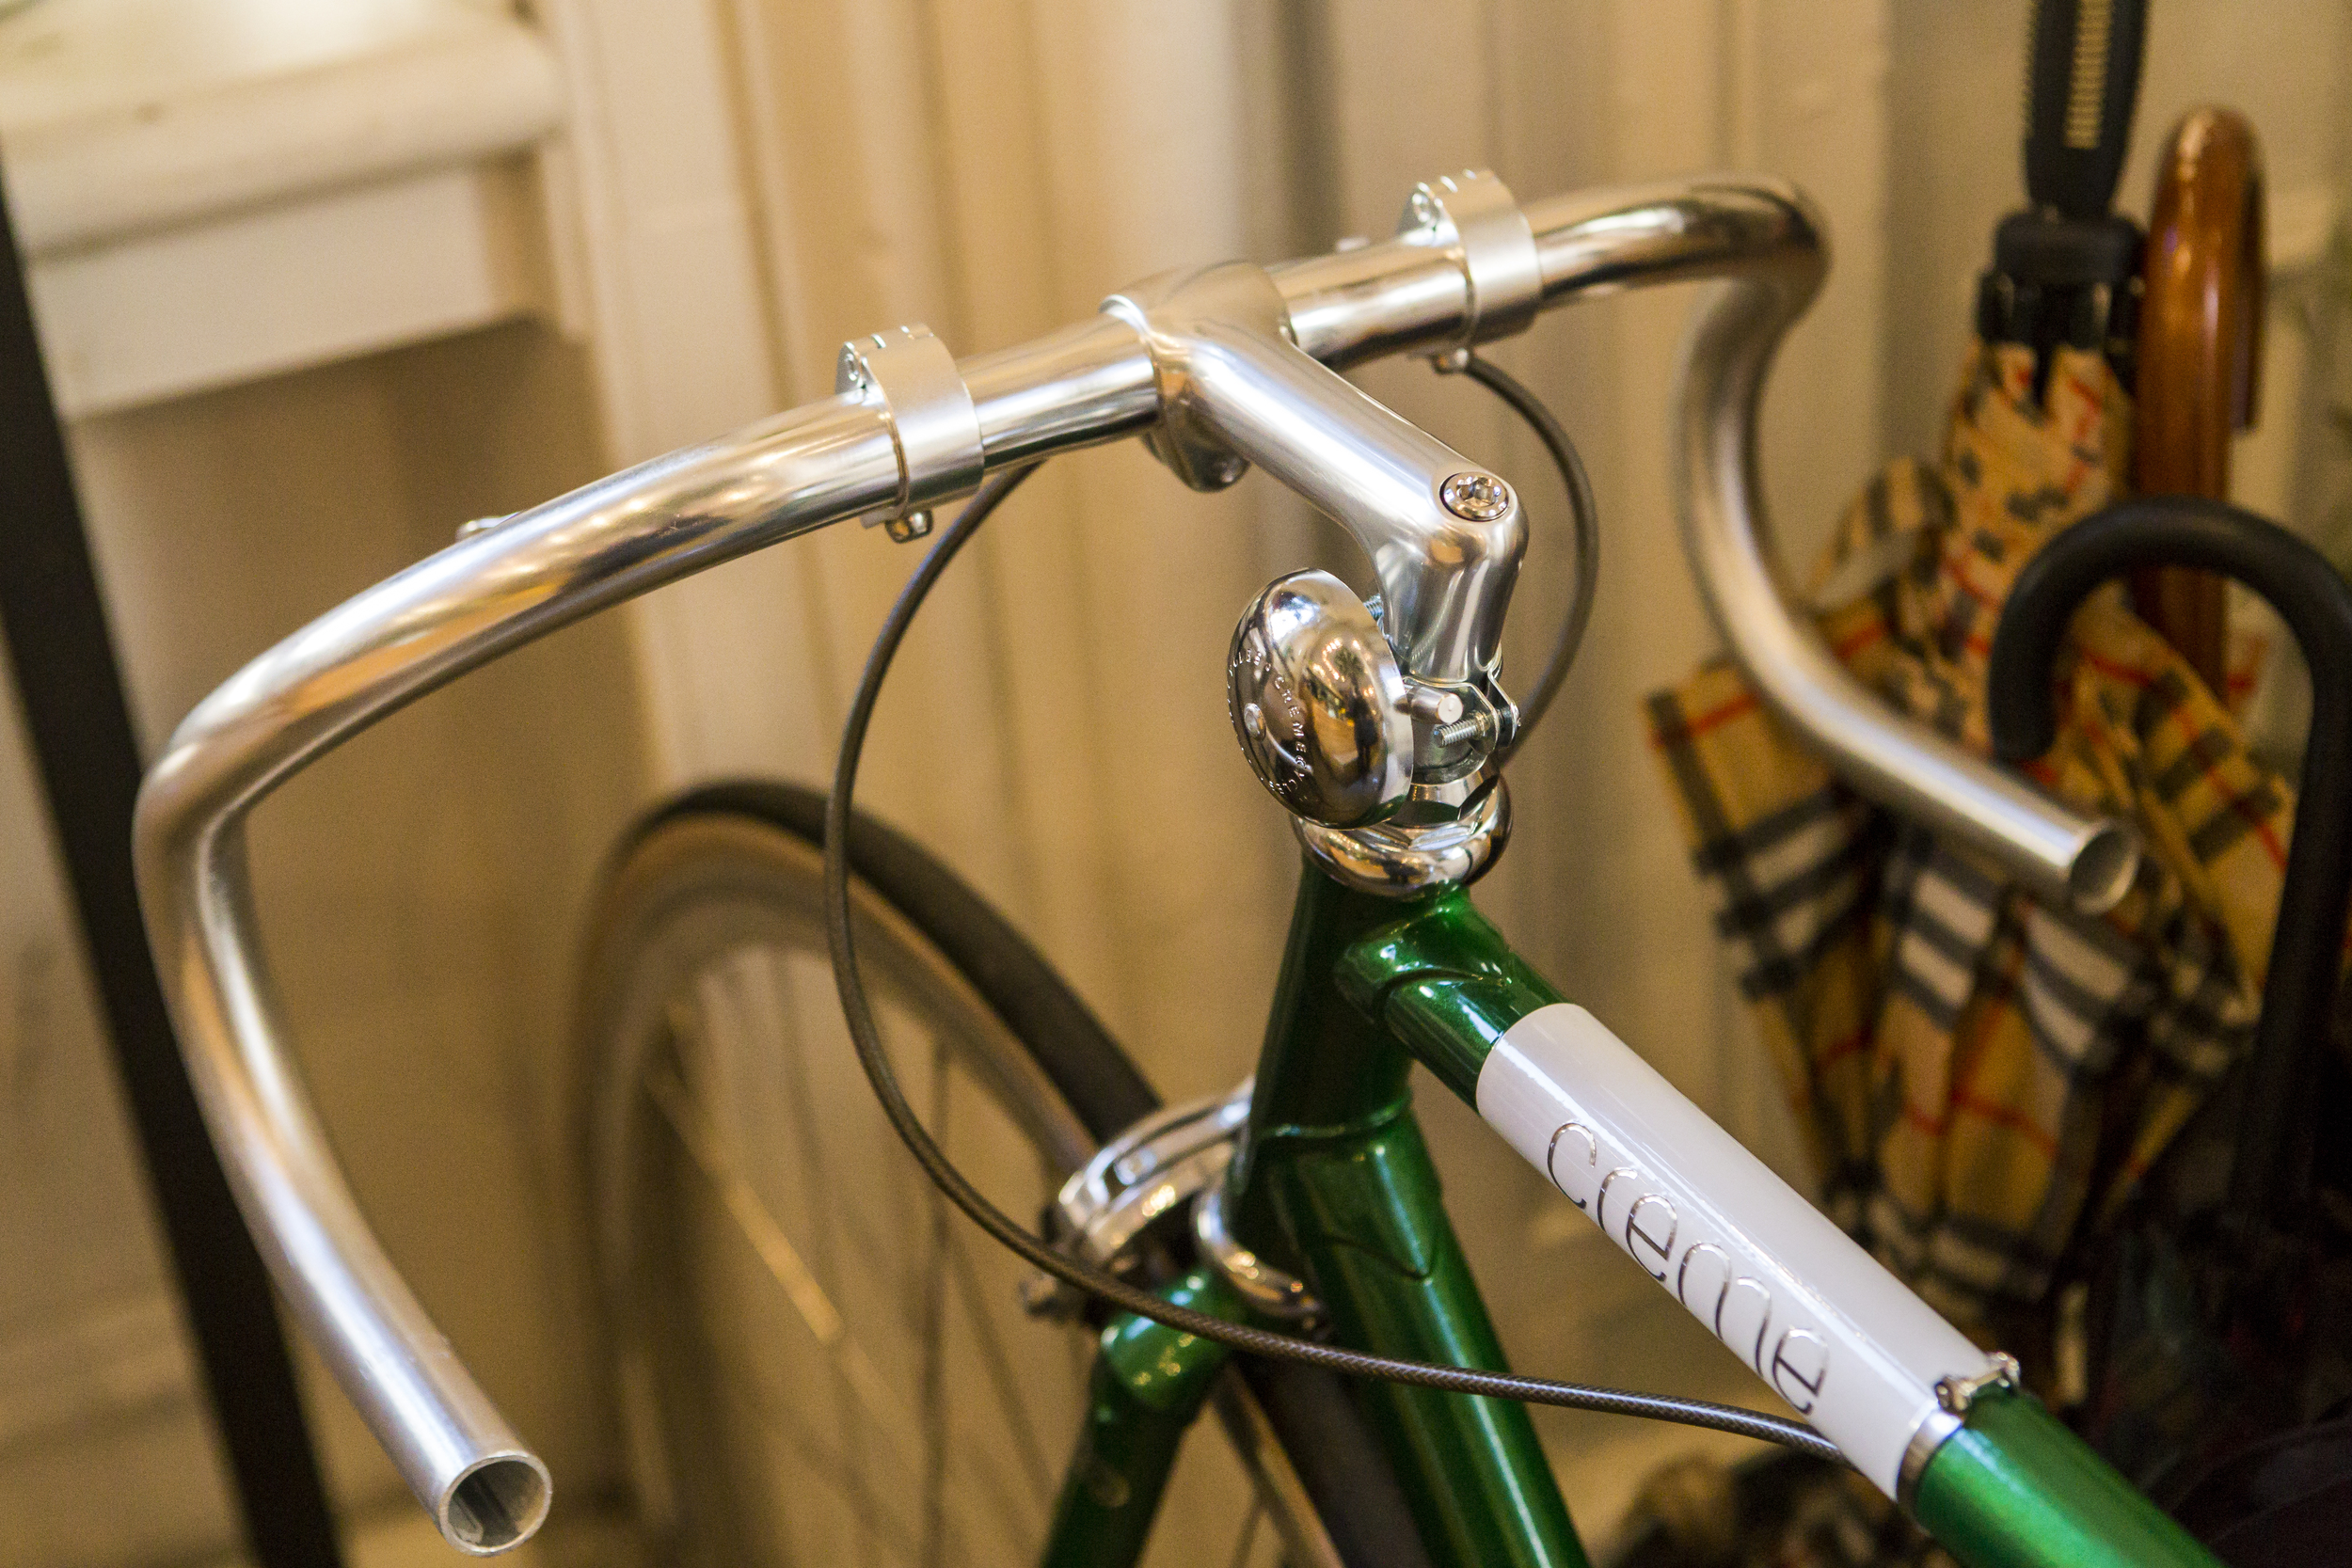 Creme Cycles Fixed Gear Bike Montreal Canada 1.jpg